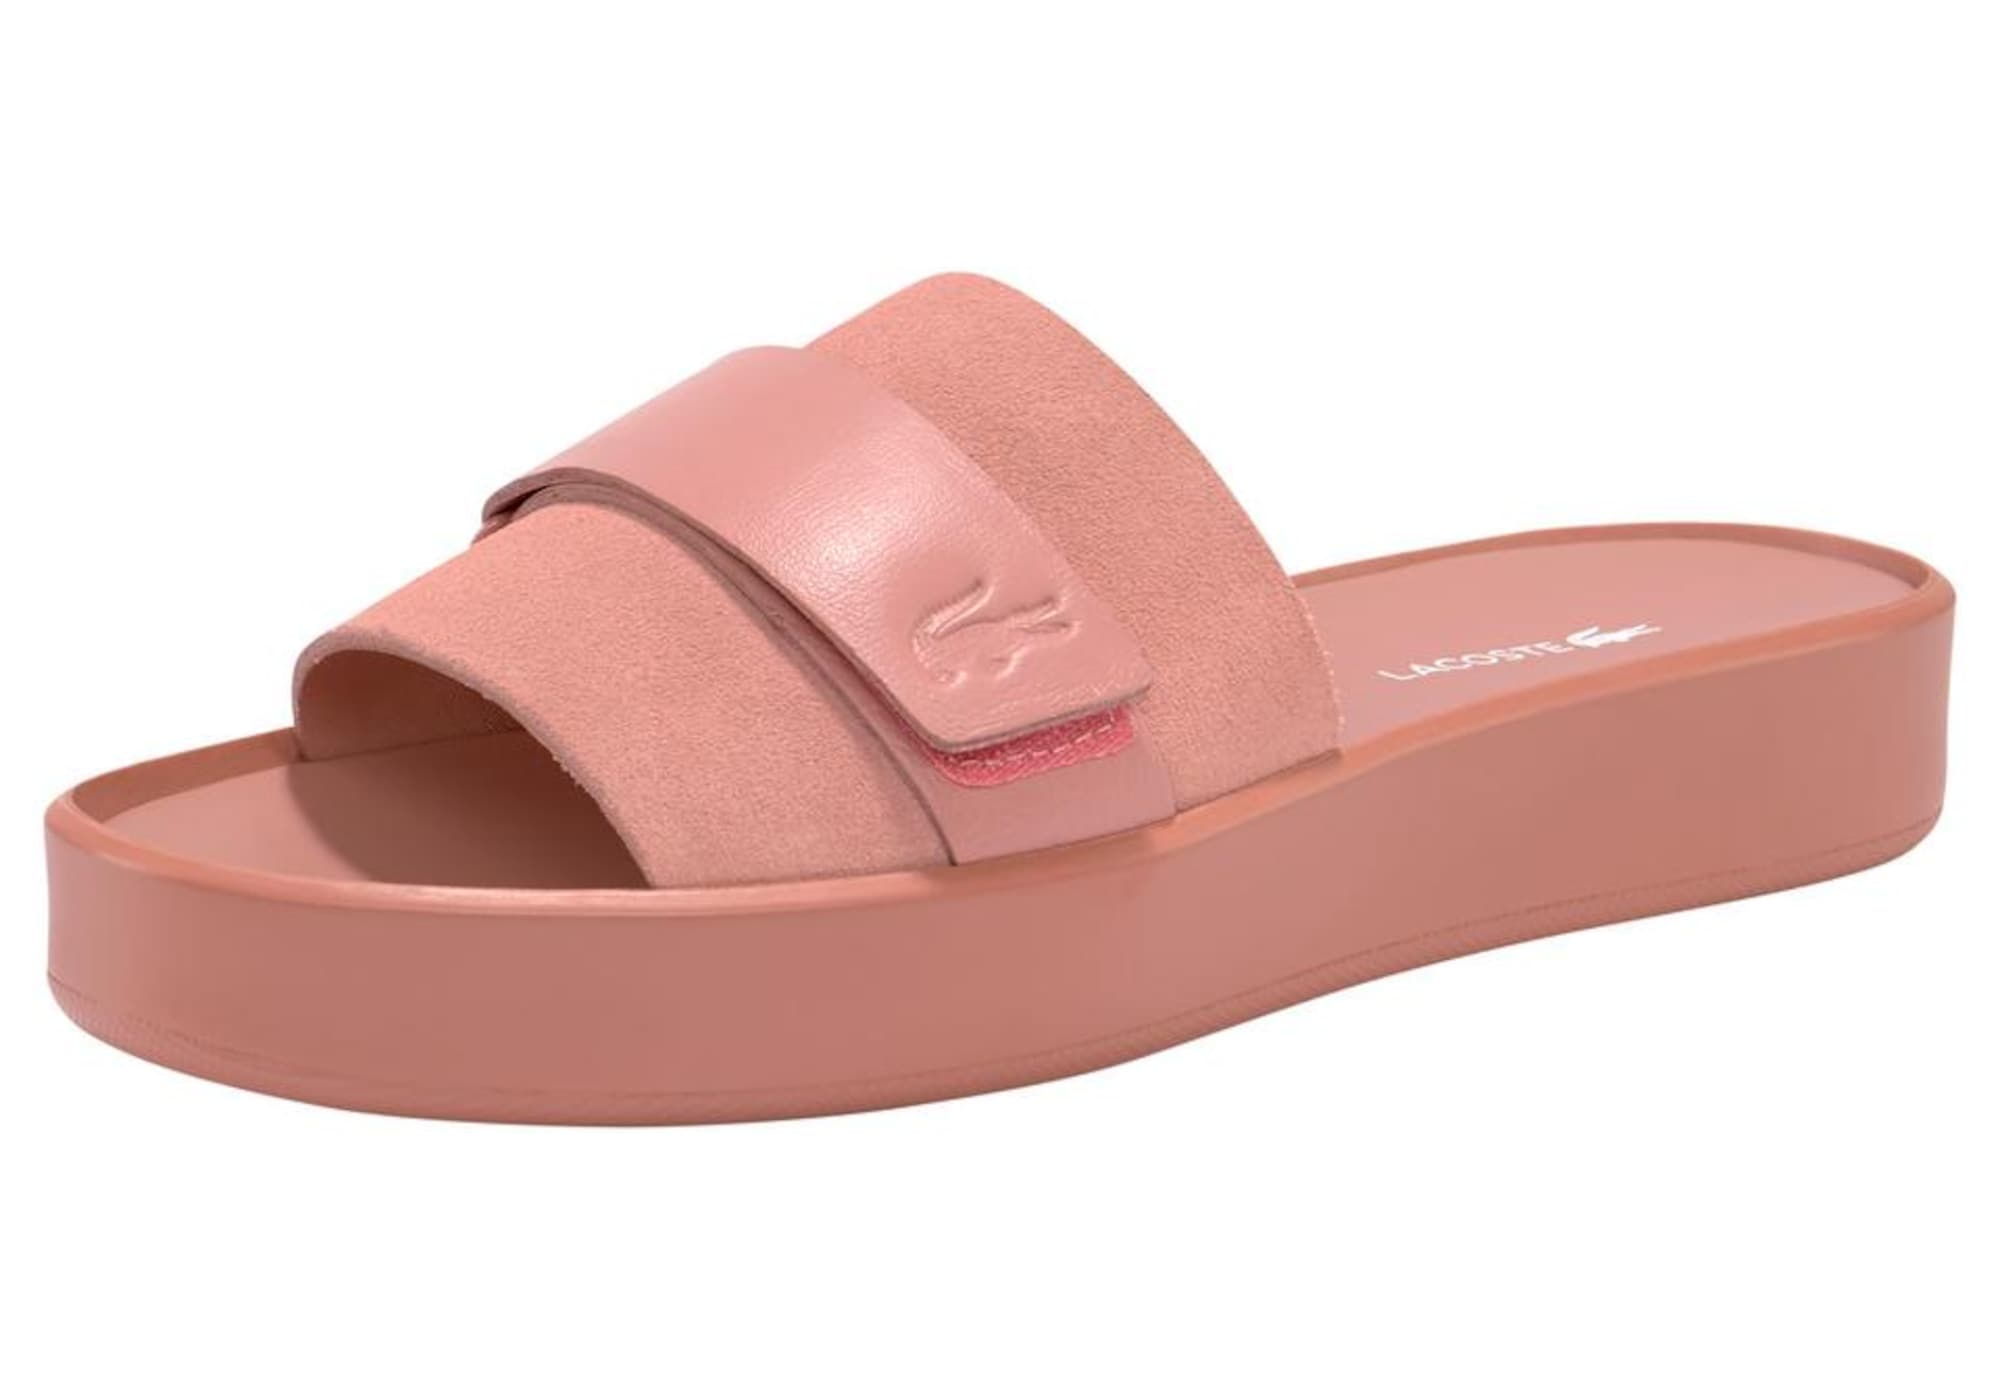 lacoste - Sneaker ´Pirle Slide 119 1 Cfa´